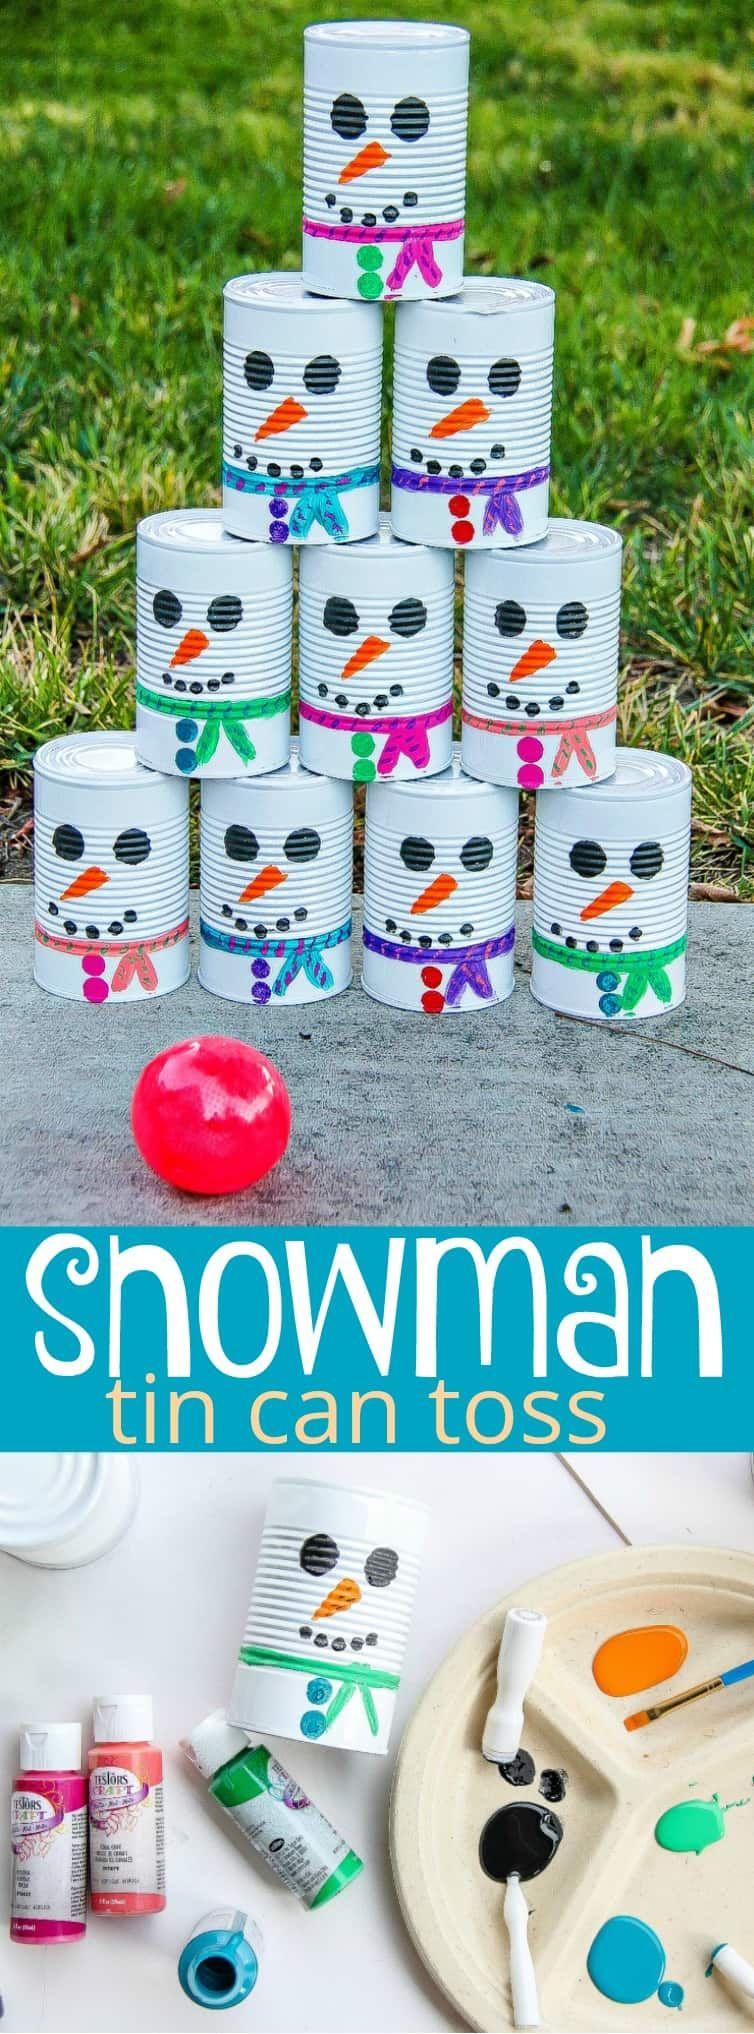 DIY Snowman Tin Can Toss - Fun Winter Activity For Kids